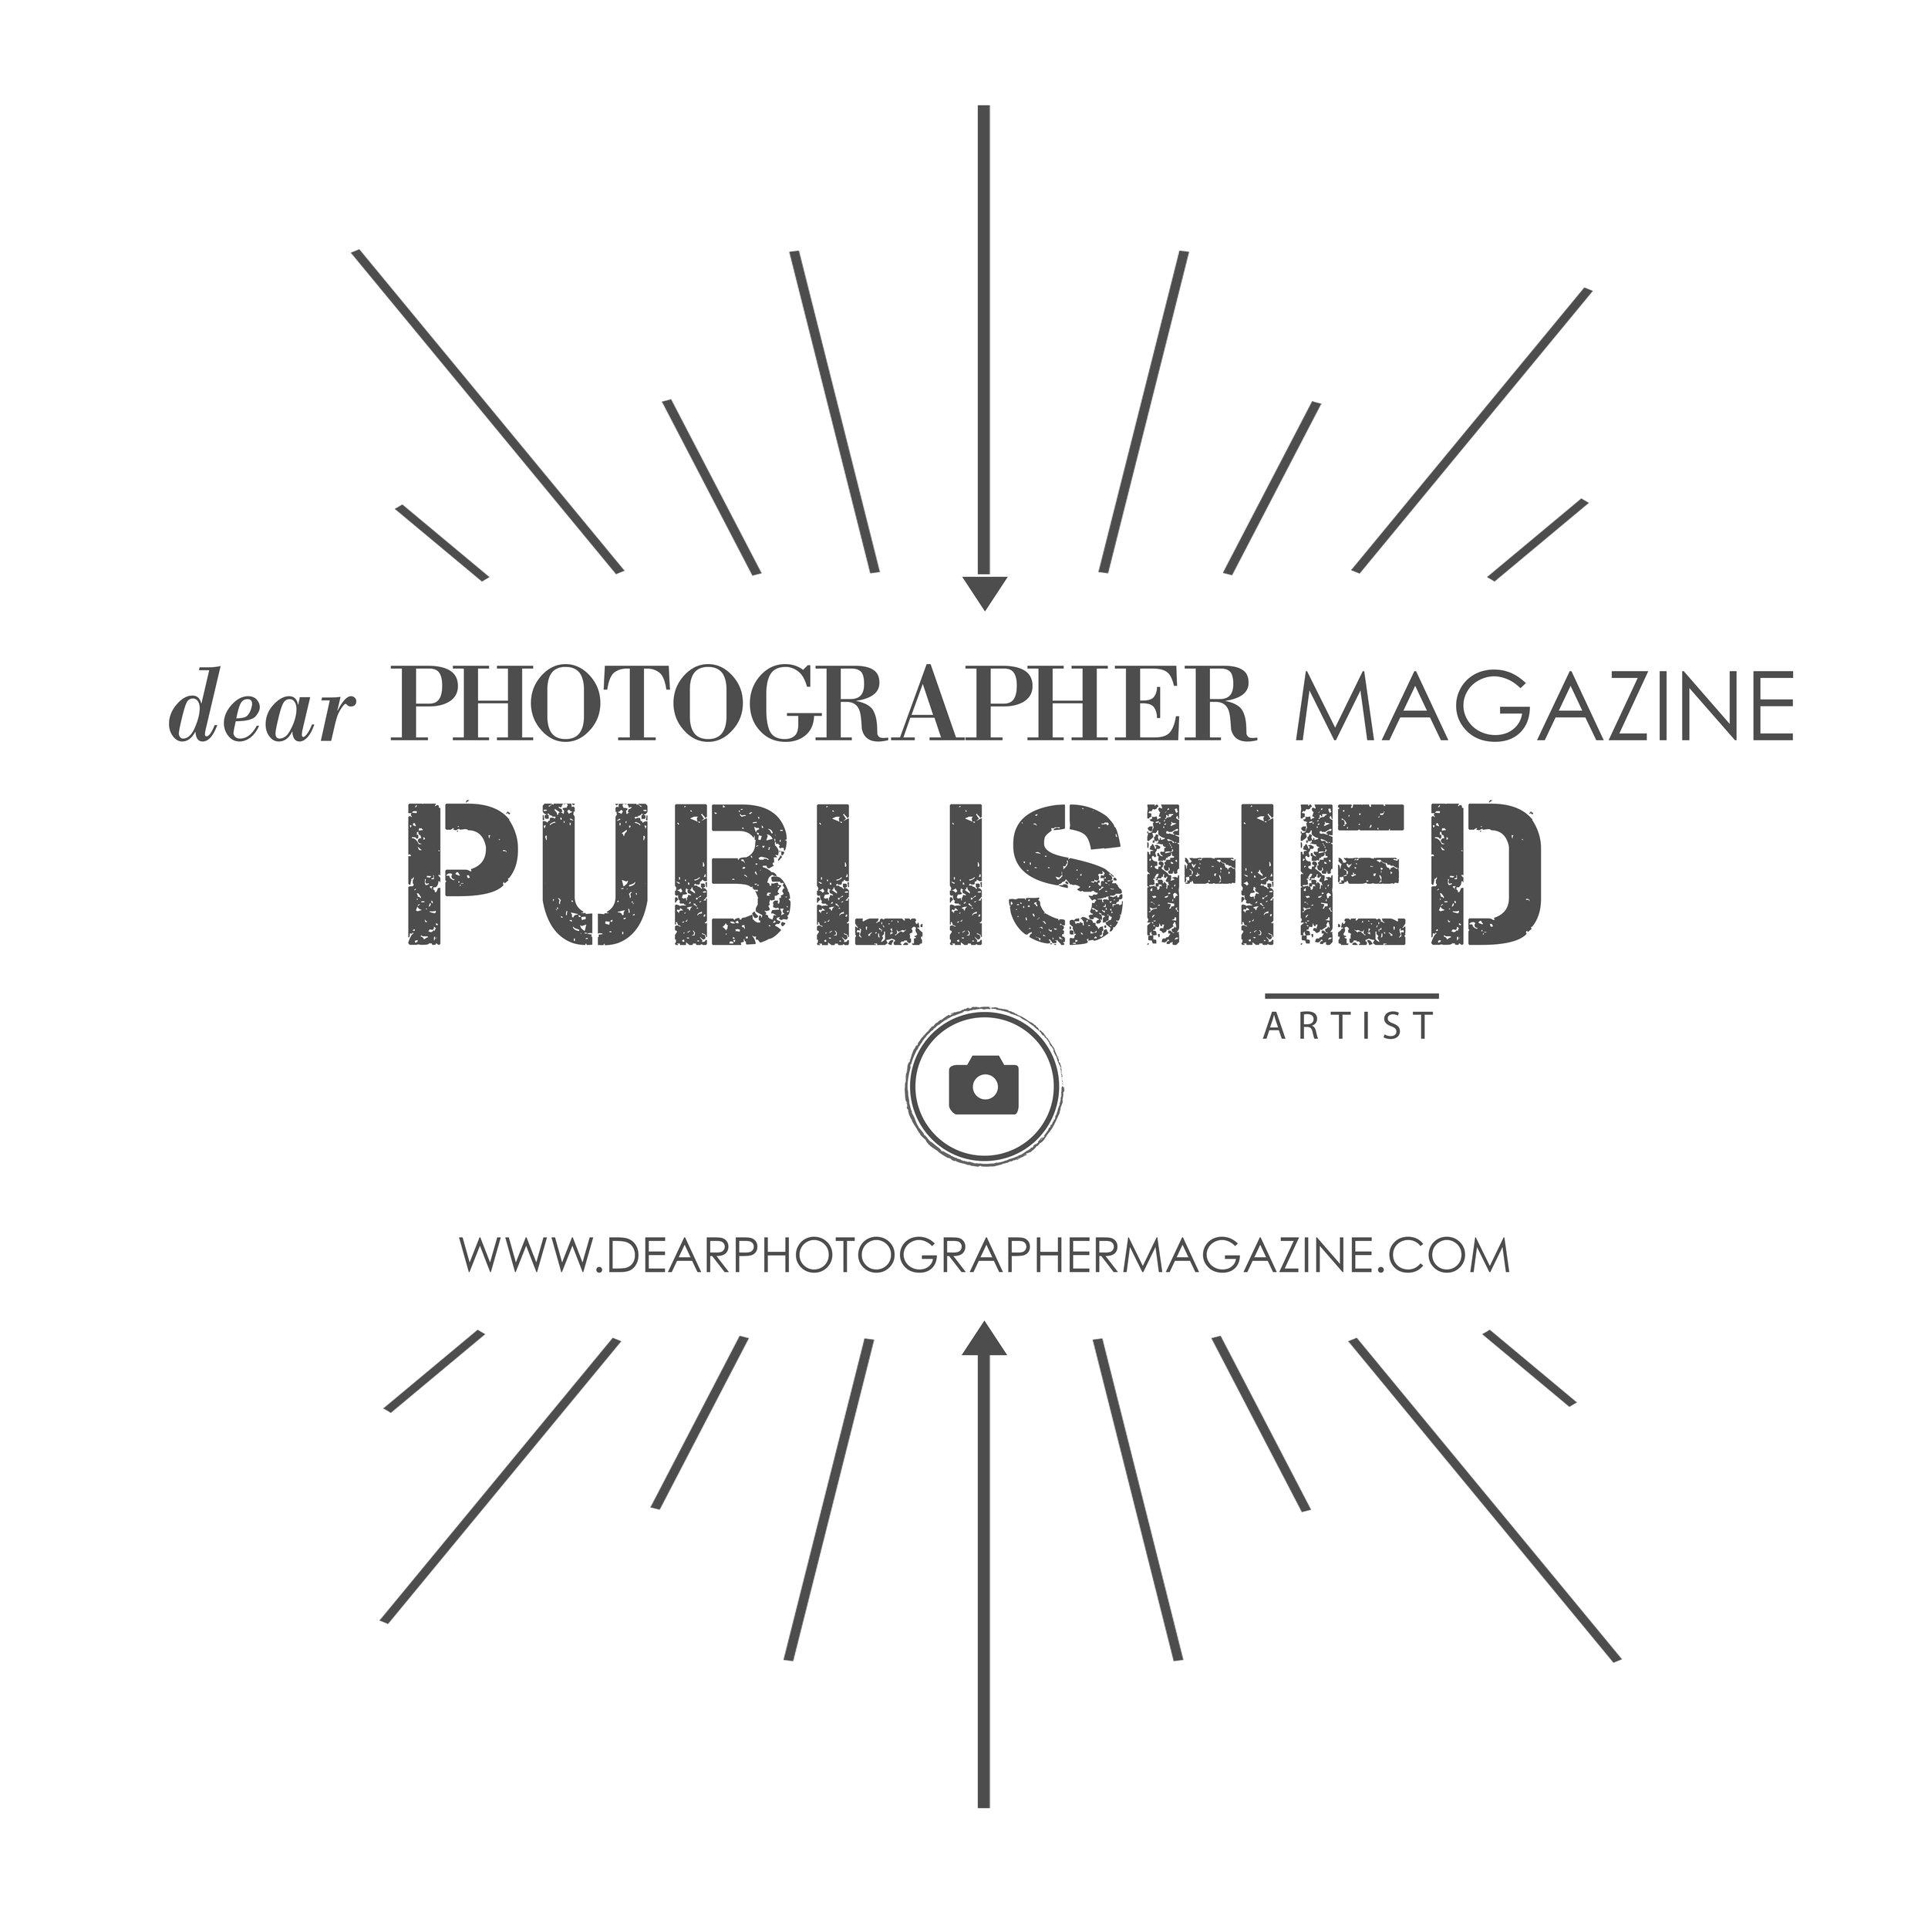 DP_Badge_Magazine_transparent.jpg